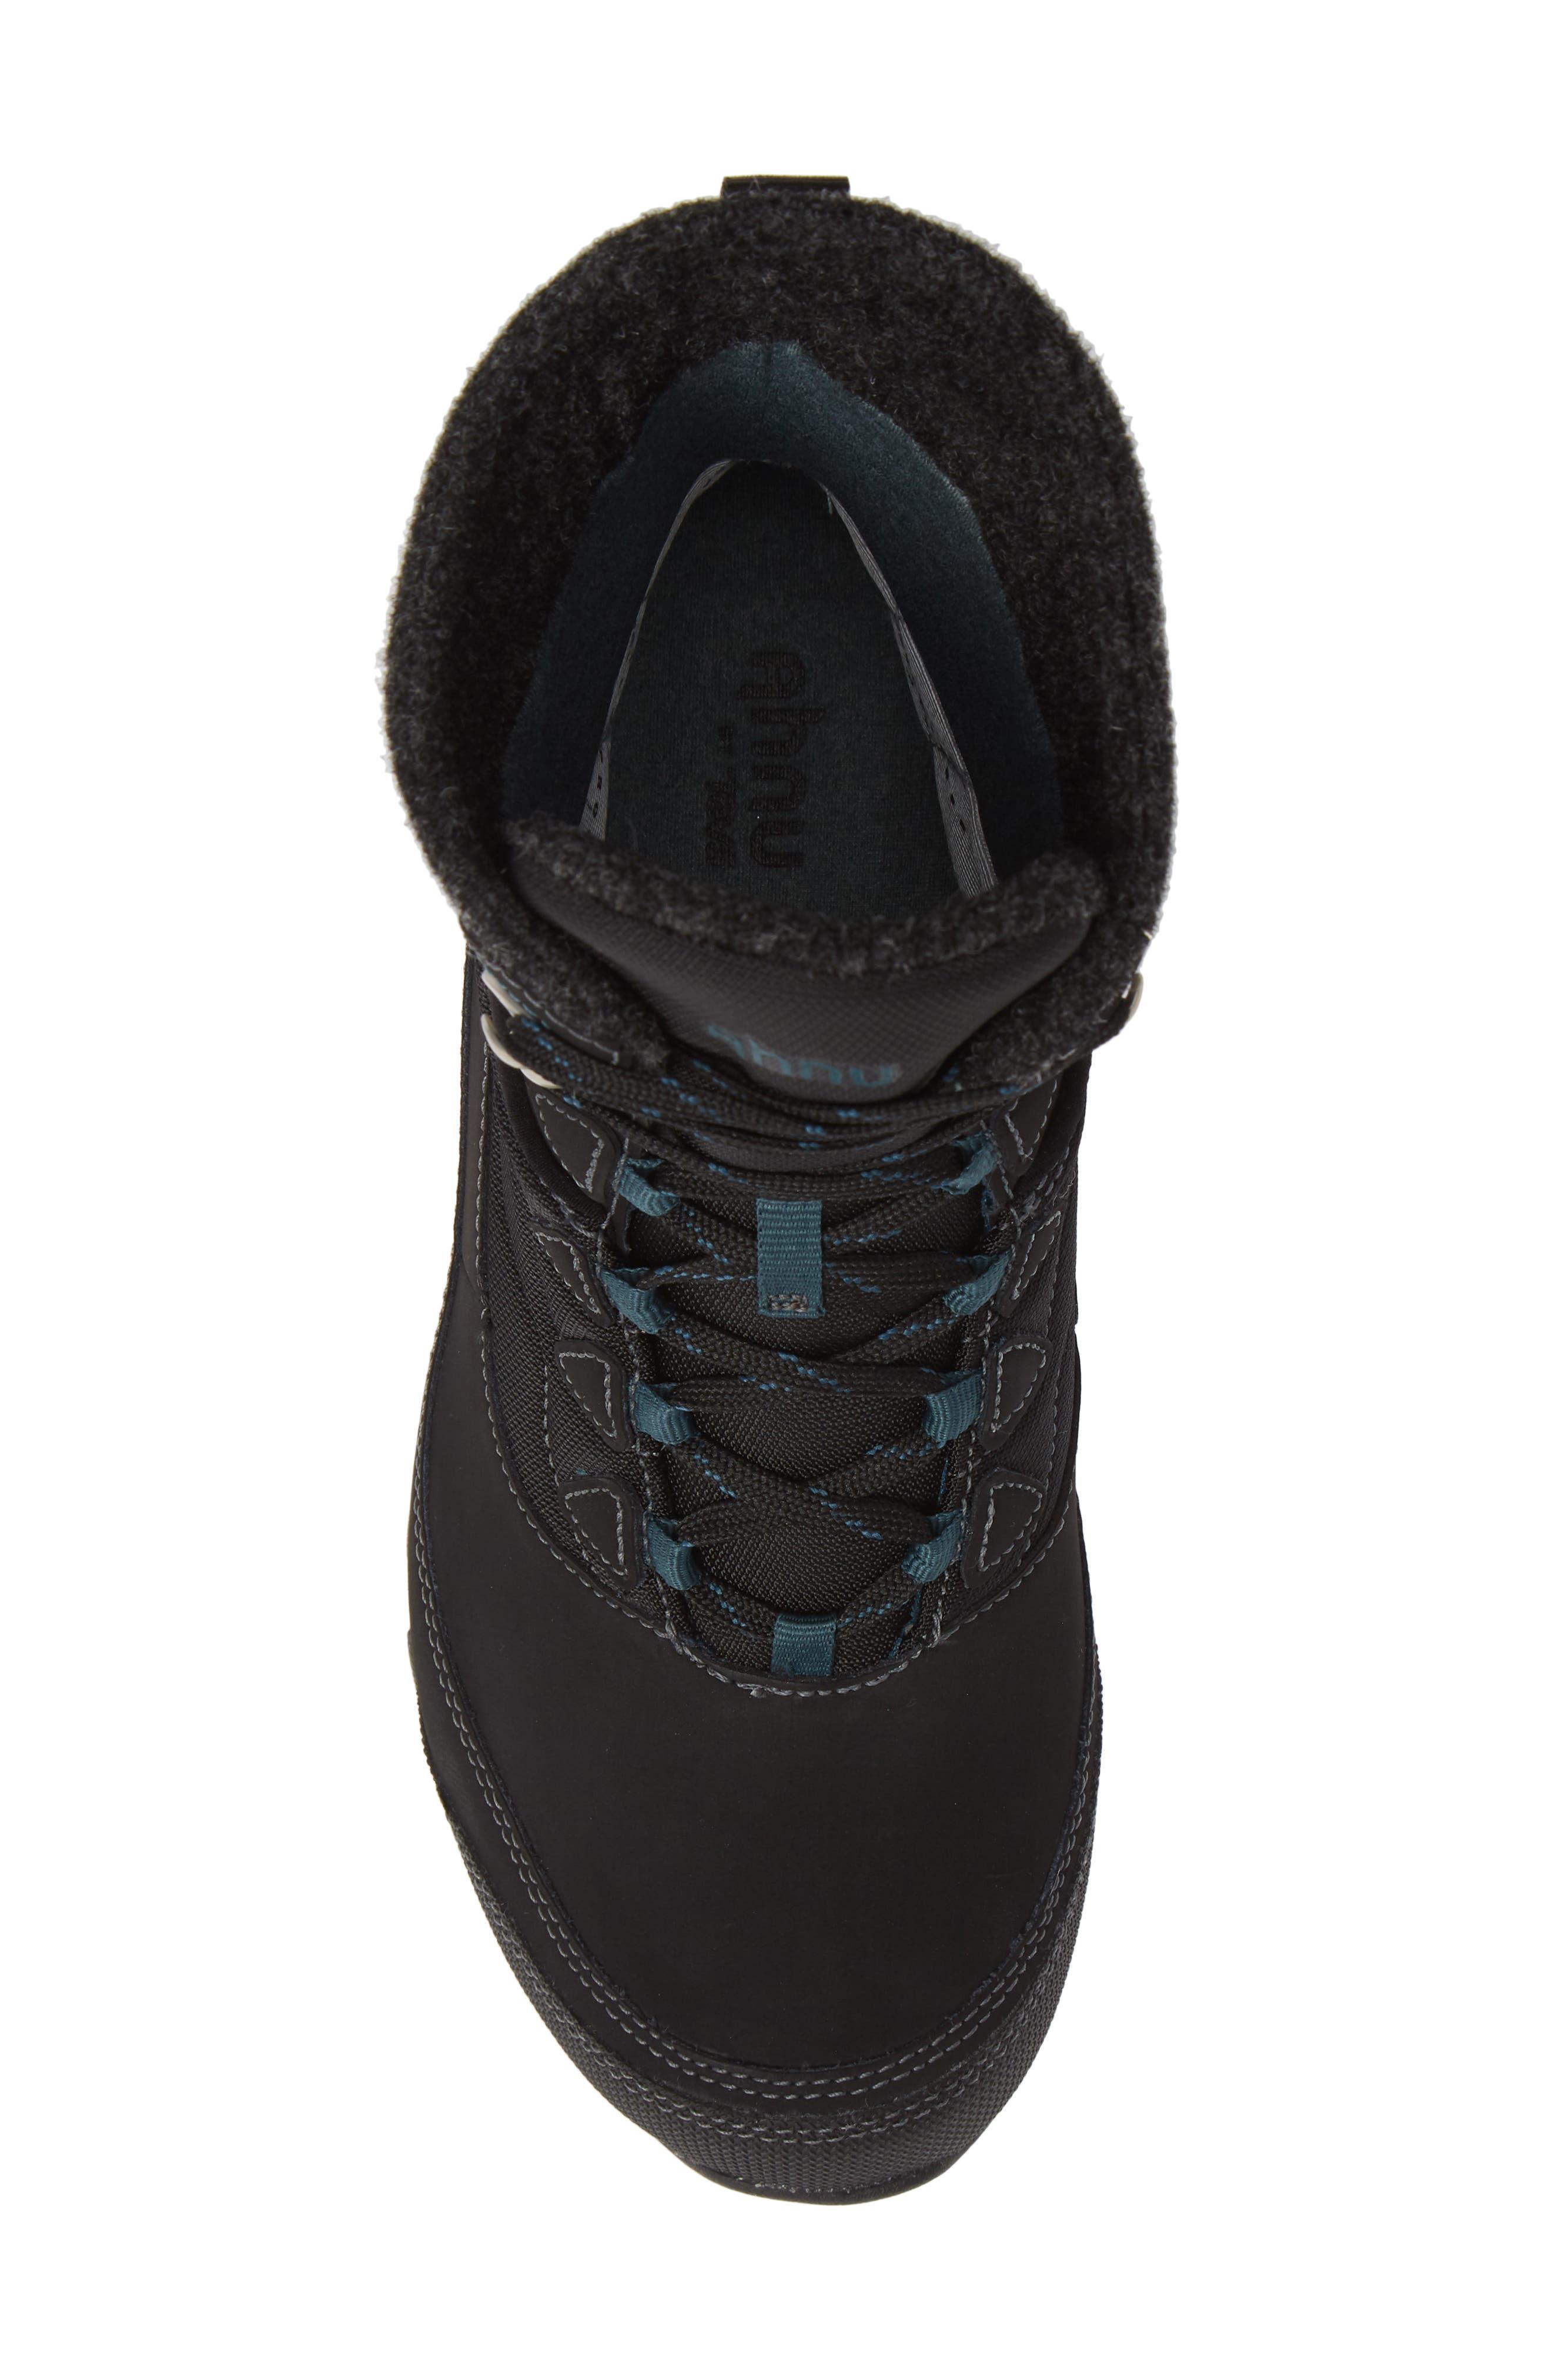 TEVA, Ahnu by Teva Sugarfrost Insulated Waterproof Boot, Alternate thumbnail 5, color, BLACK LEATHER